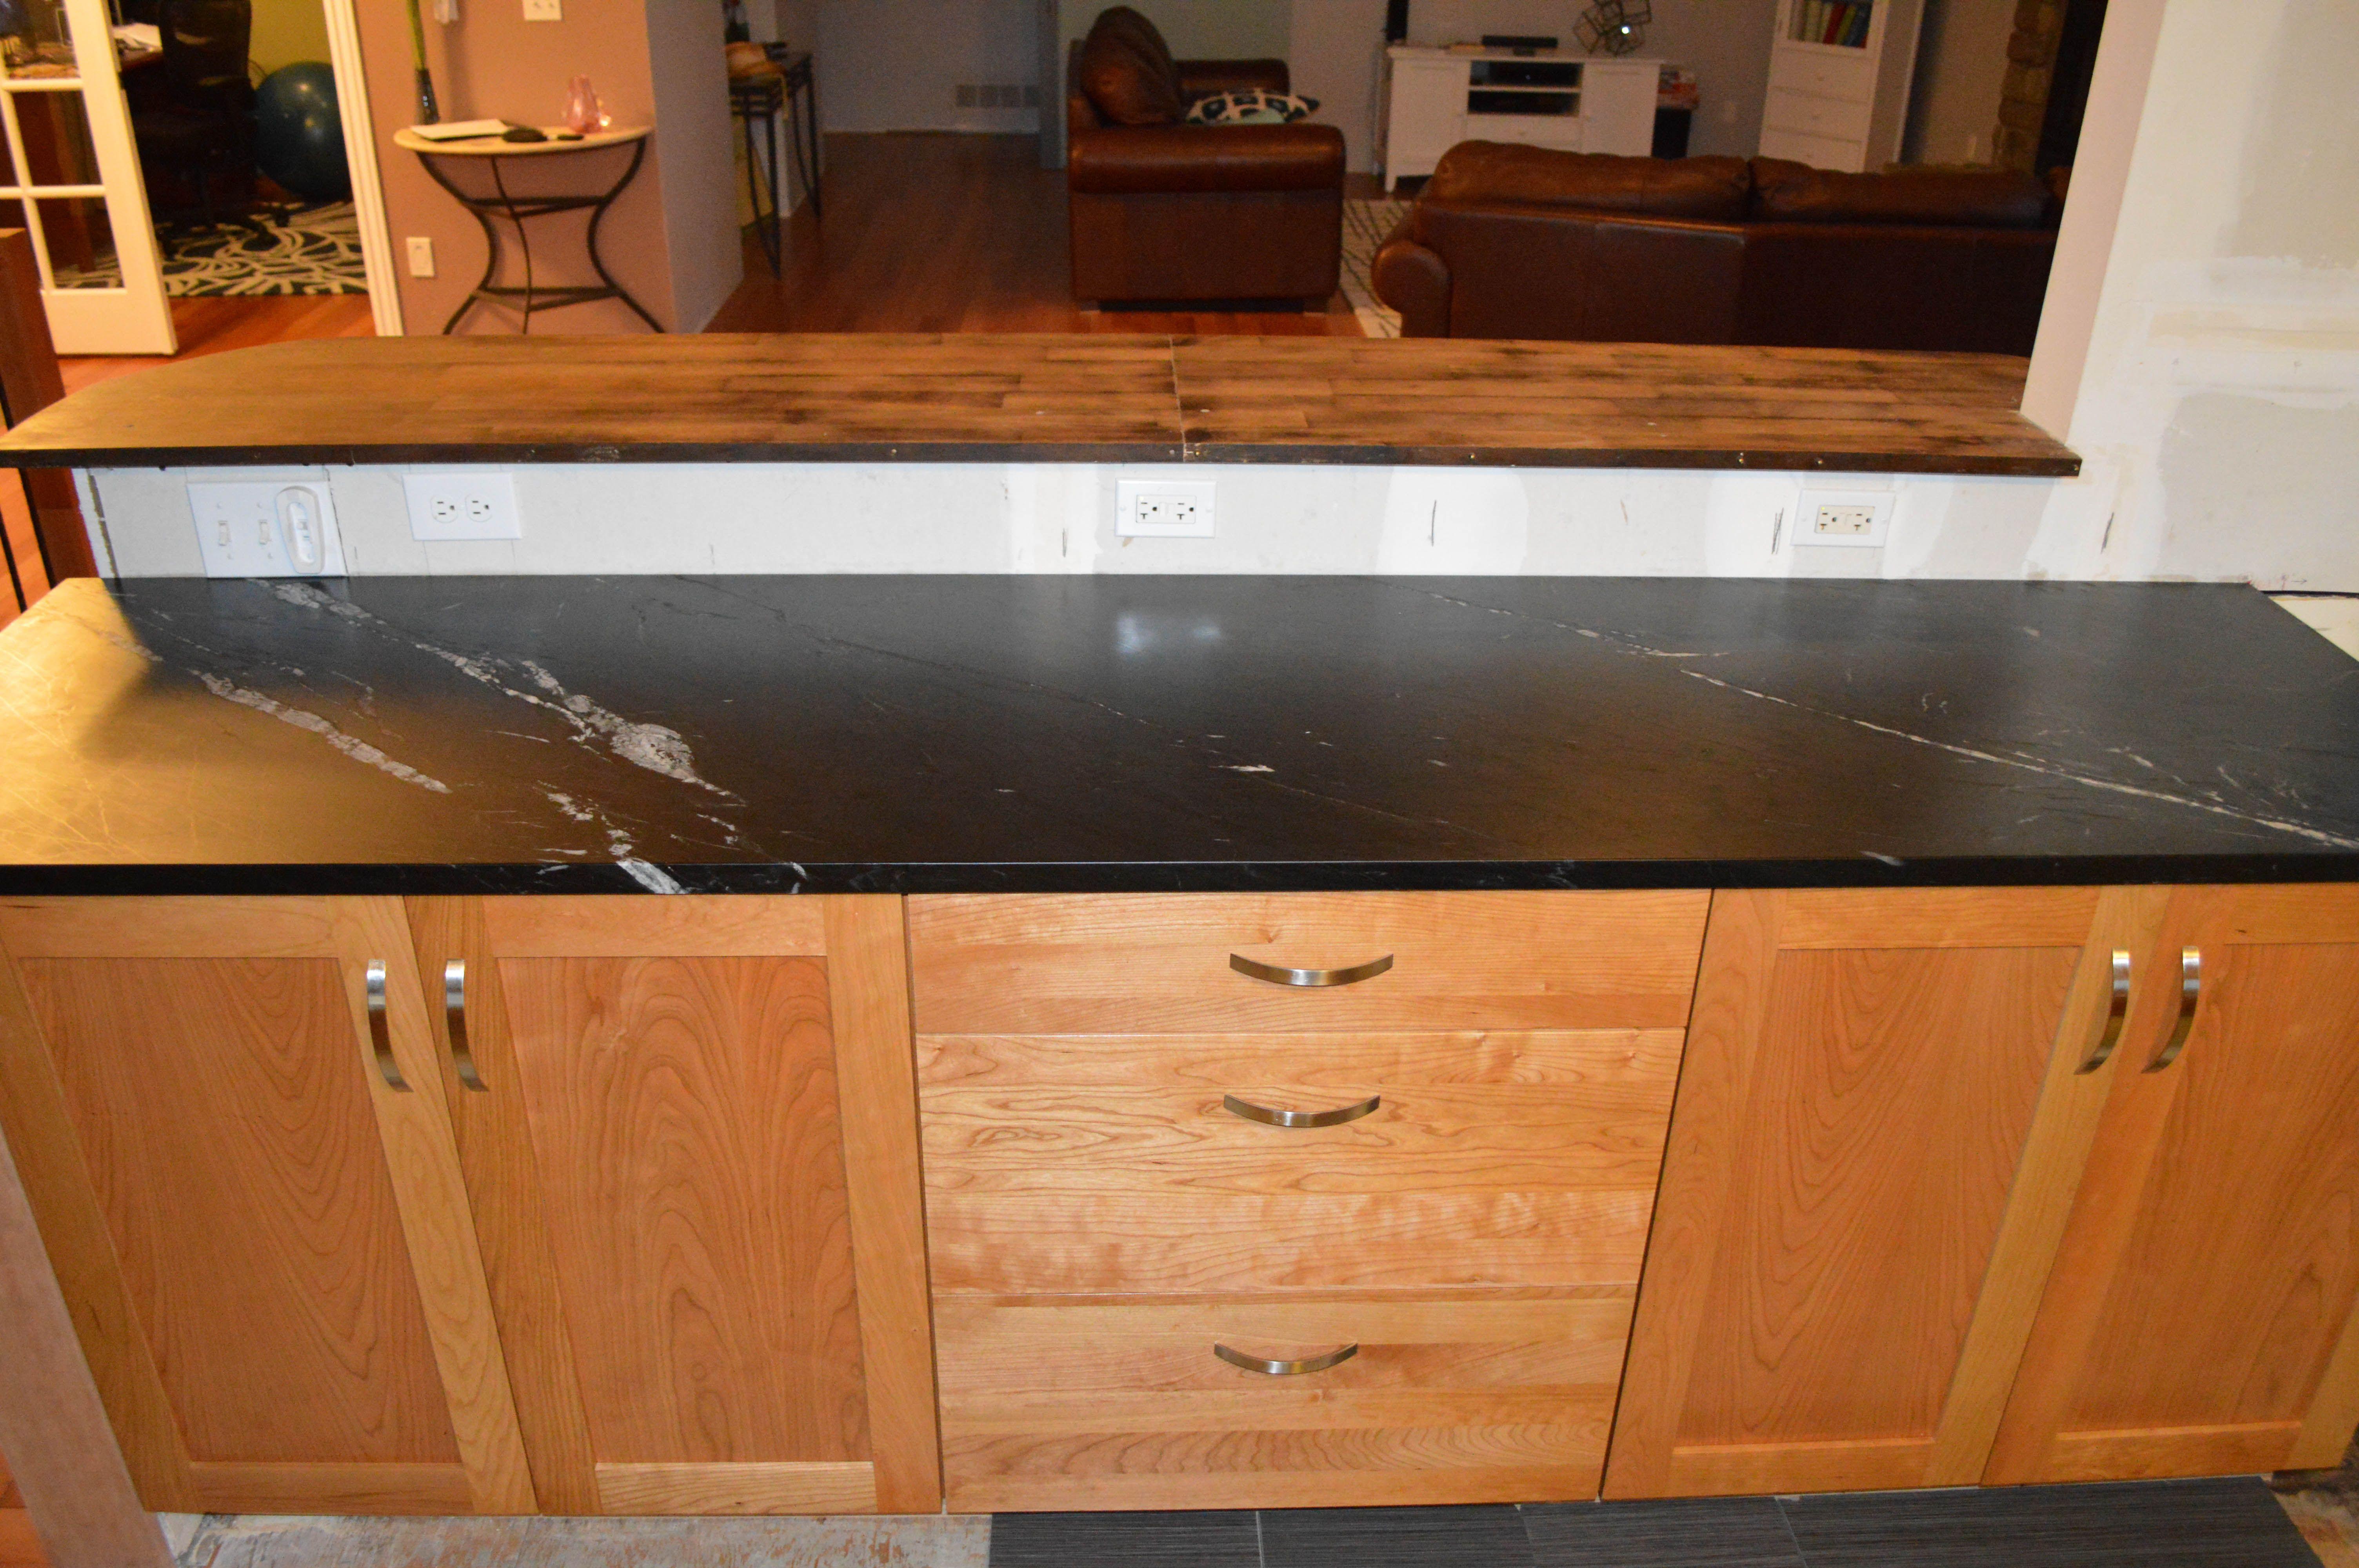 Perfect Cherry Cabinets From Barkercabinets.com U0026 Noire Soapstone Countertop From  Dorado Soapstone